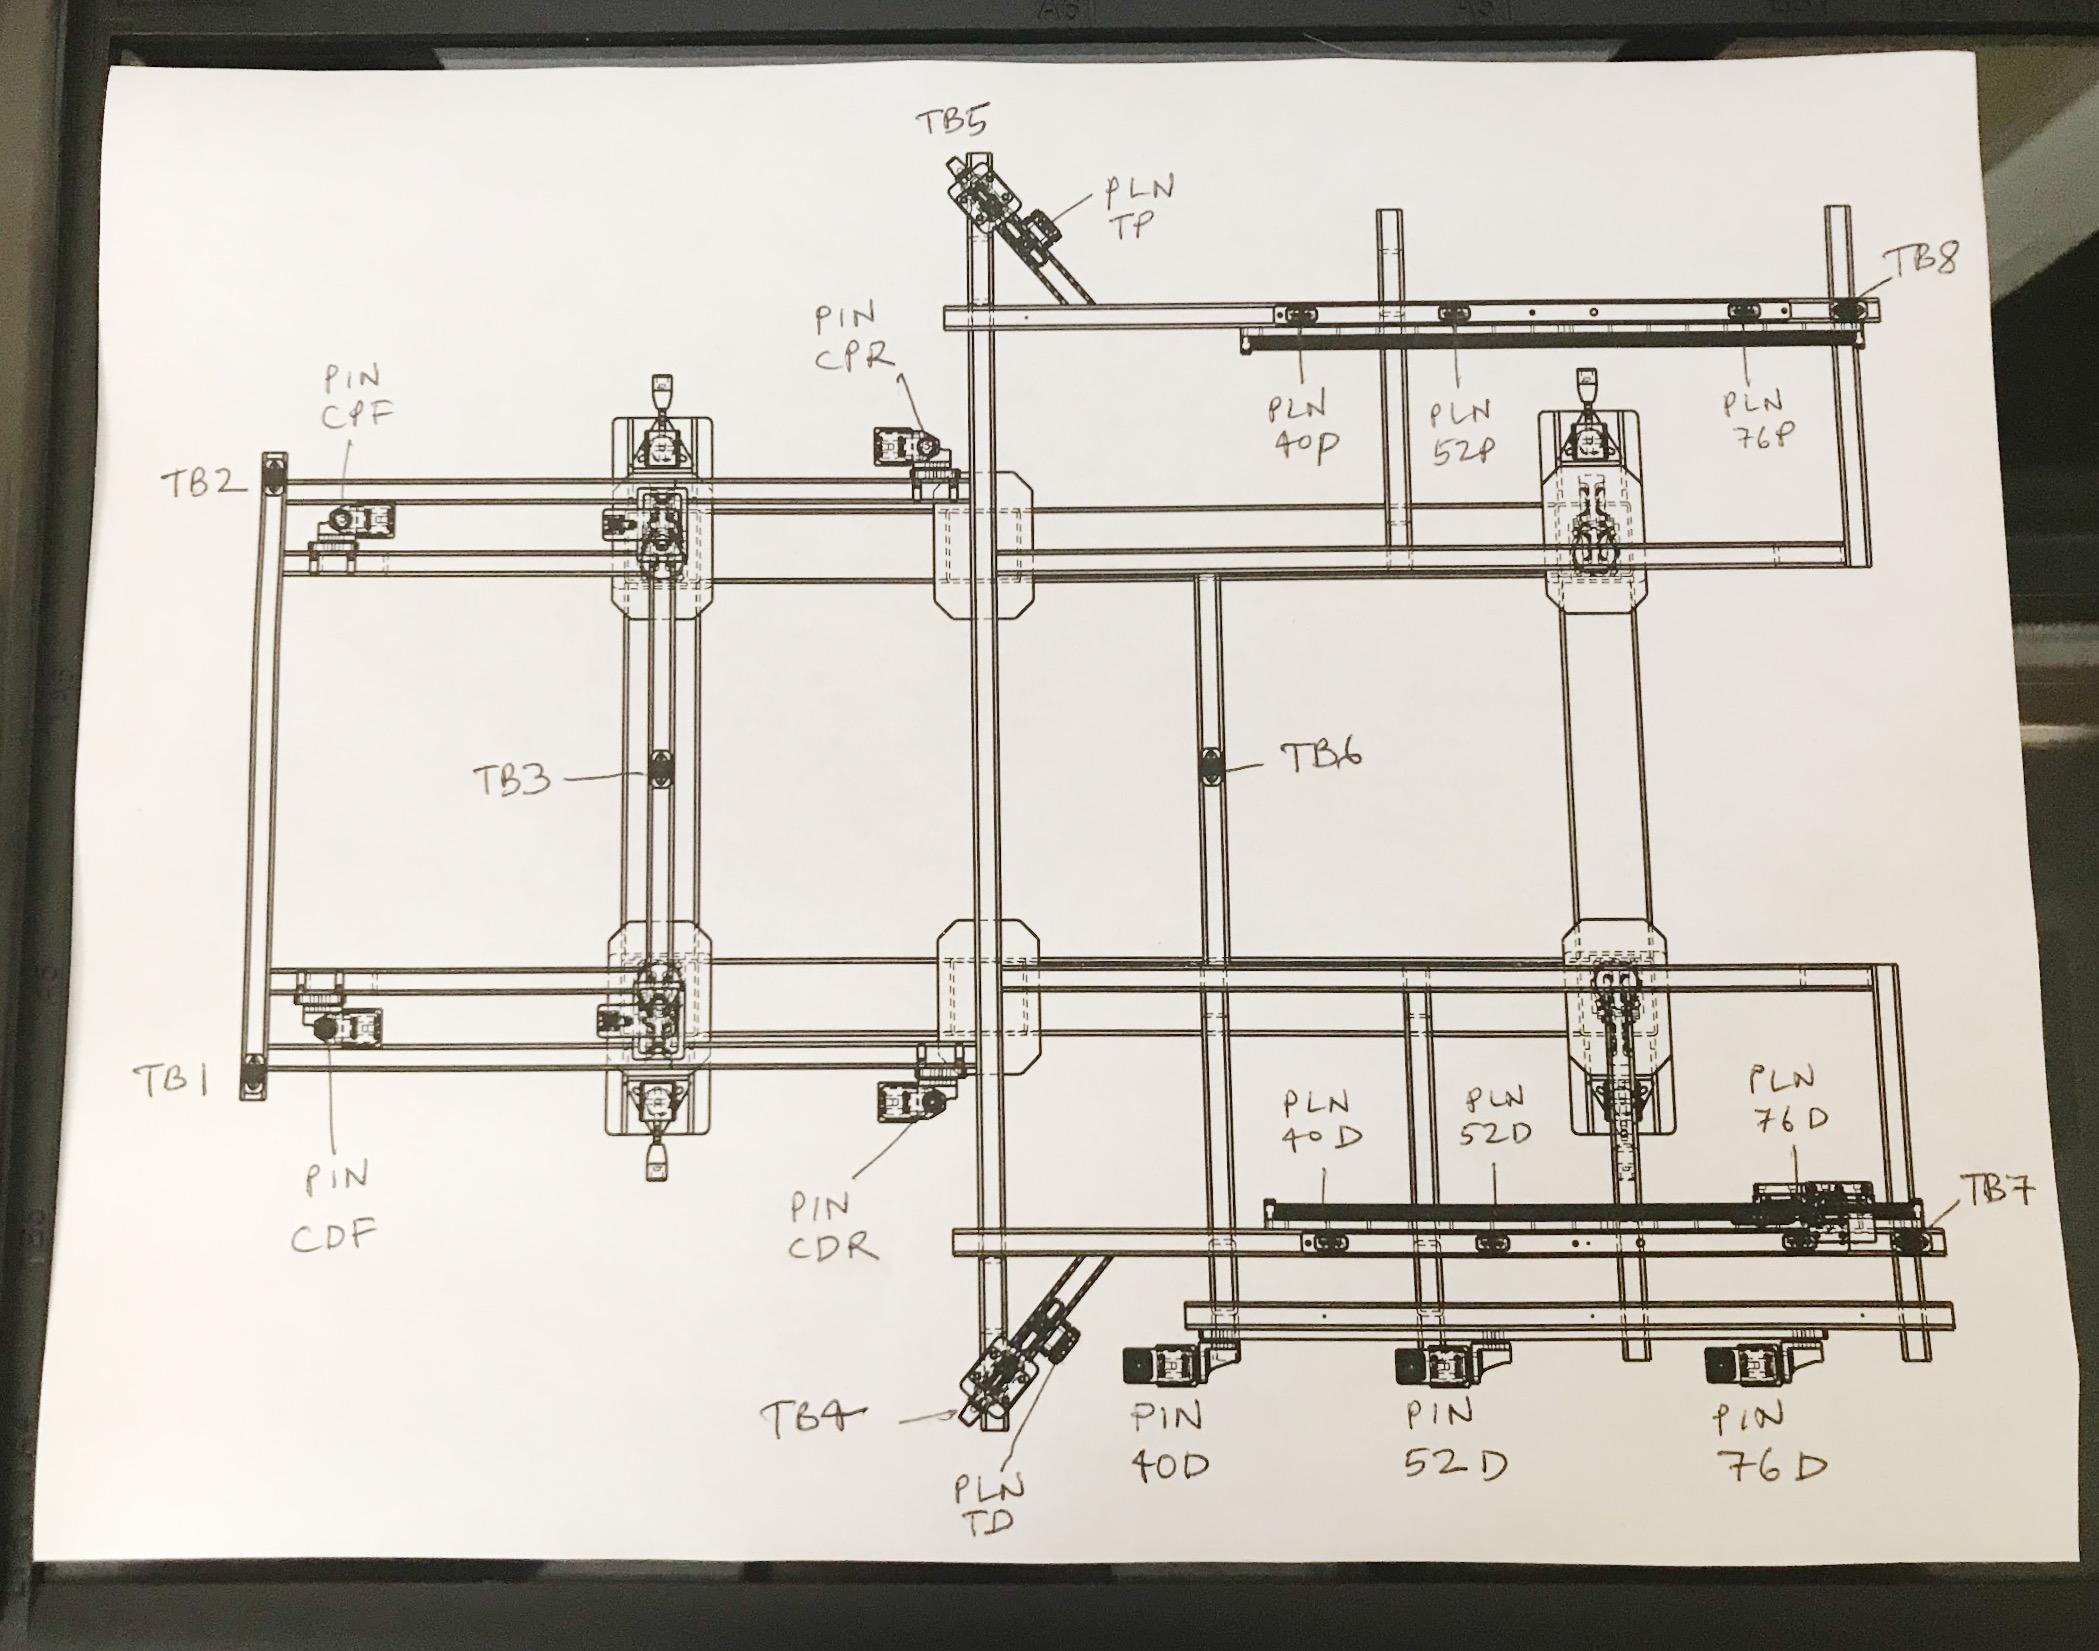 assembly fixtures texas industrial machine & design 4.jpg